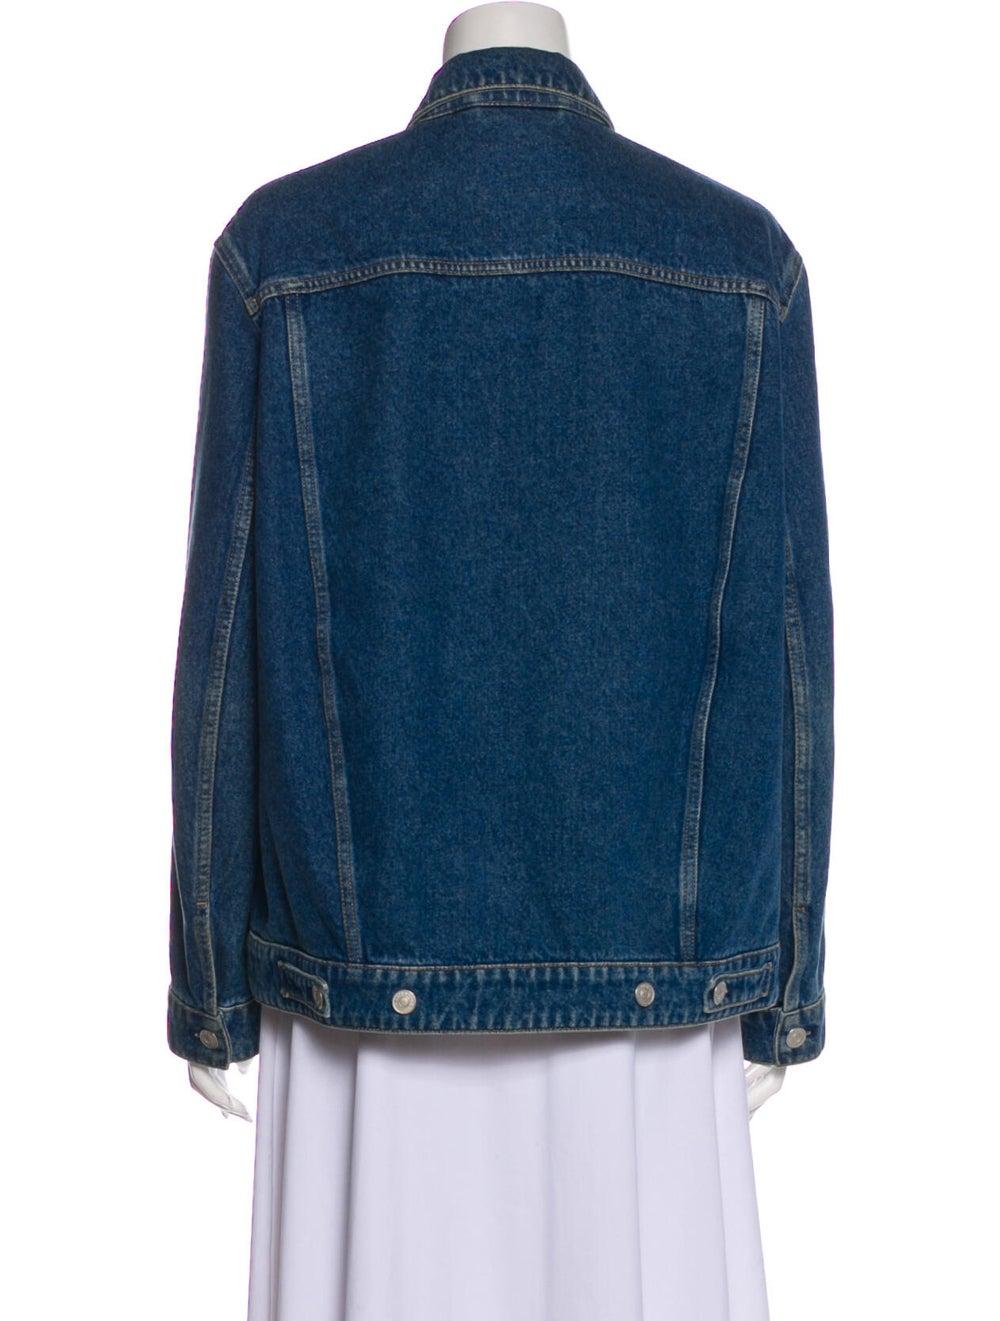 Balenciaga 2019 Denim Jacket Denim - image 3